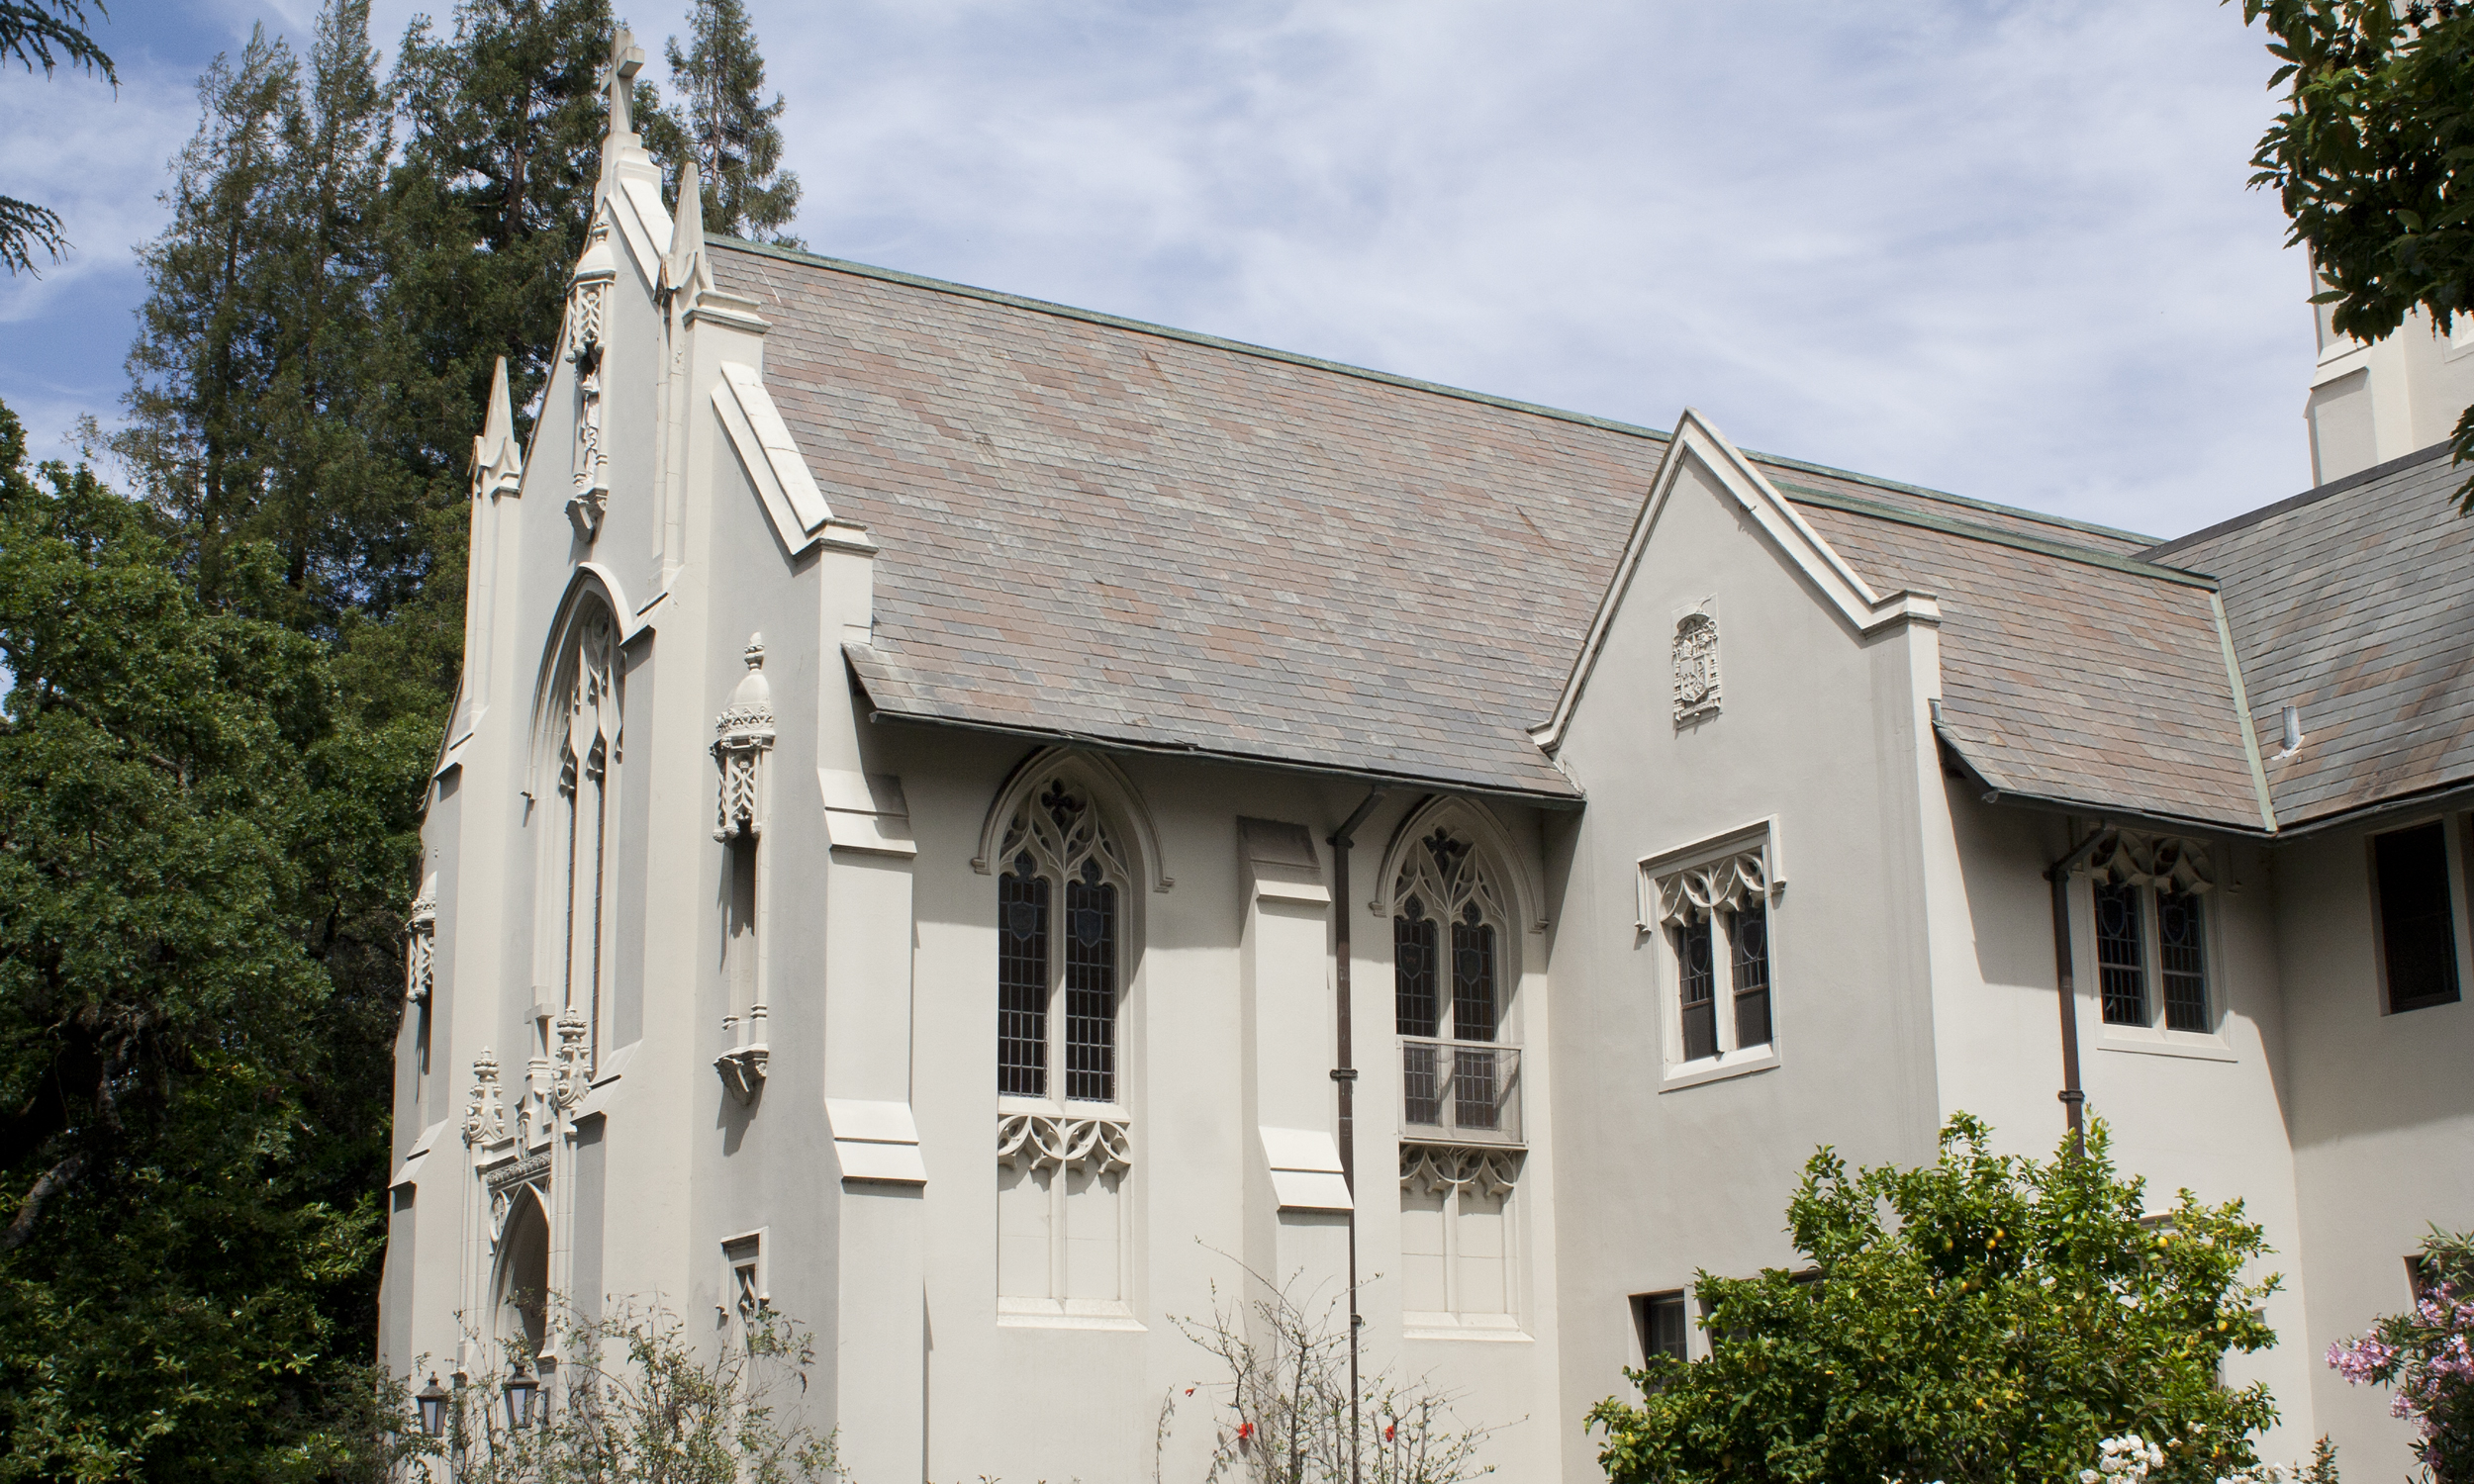 chapel hoursand location -